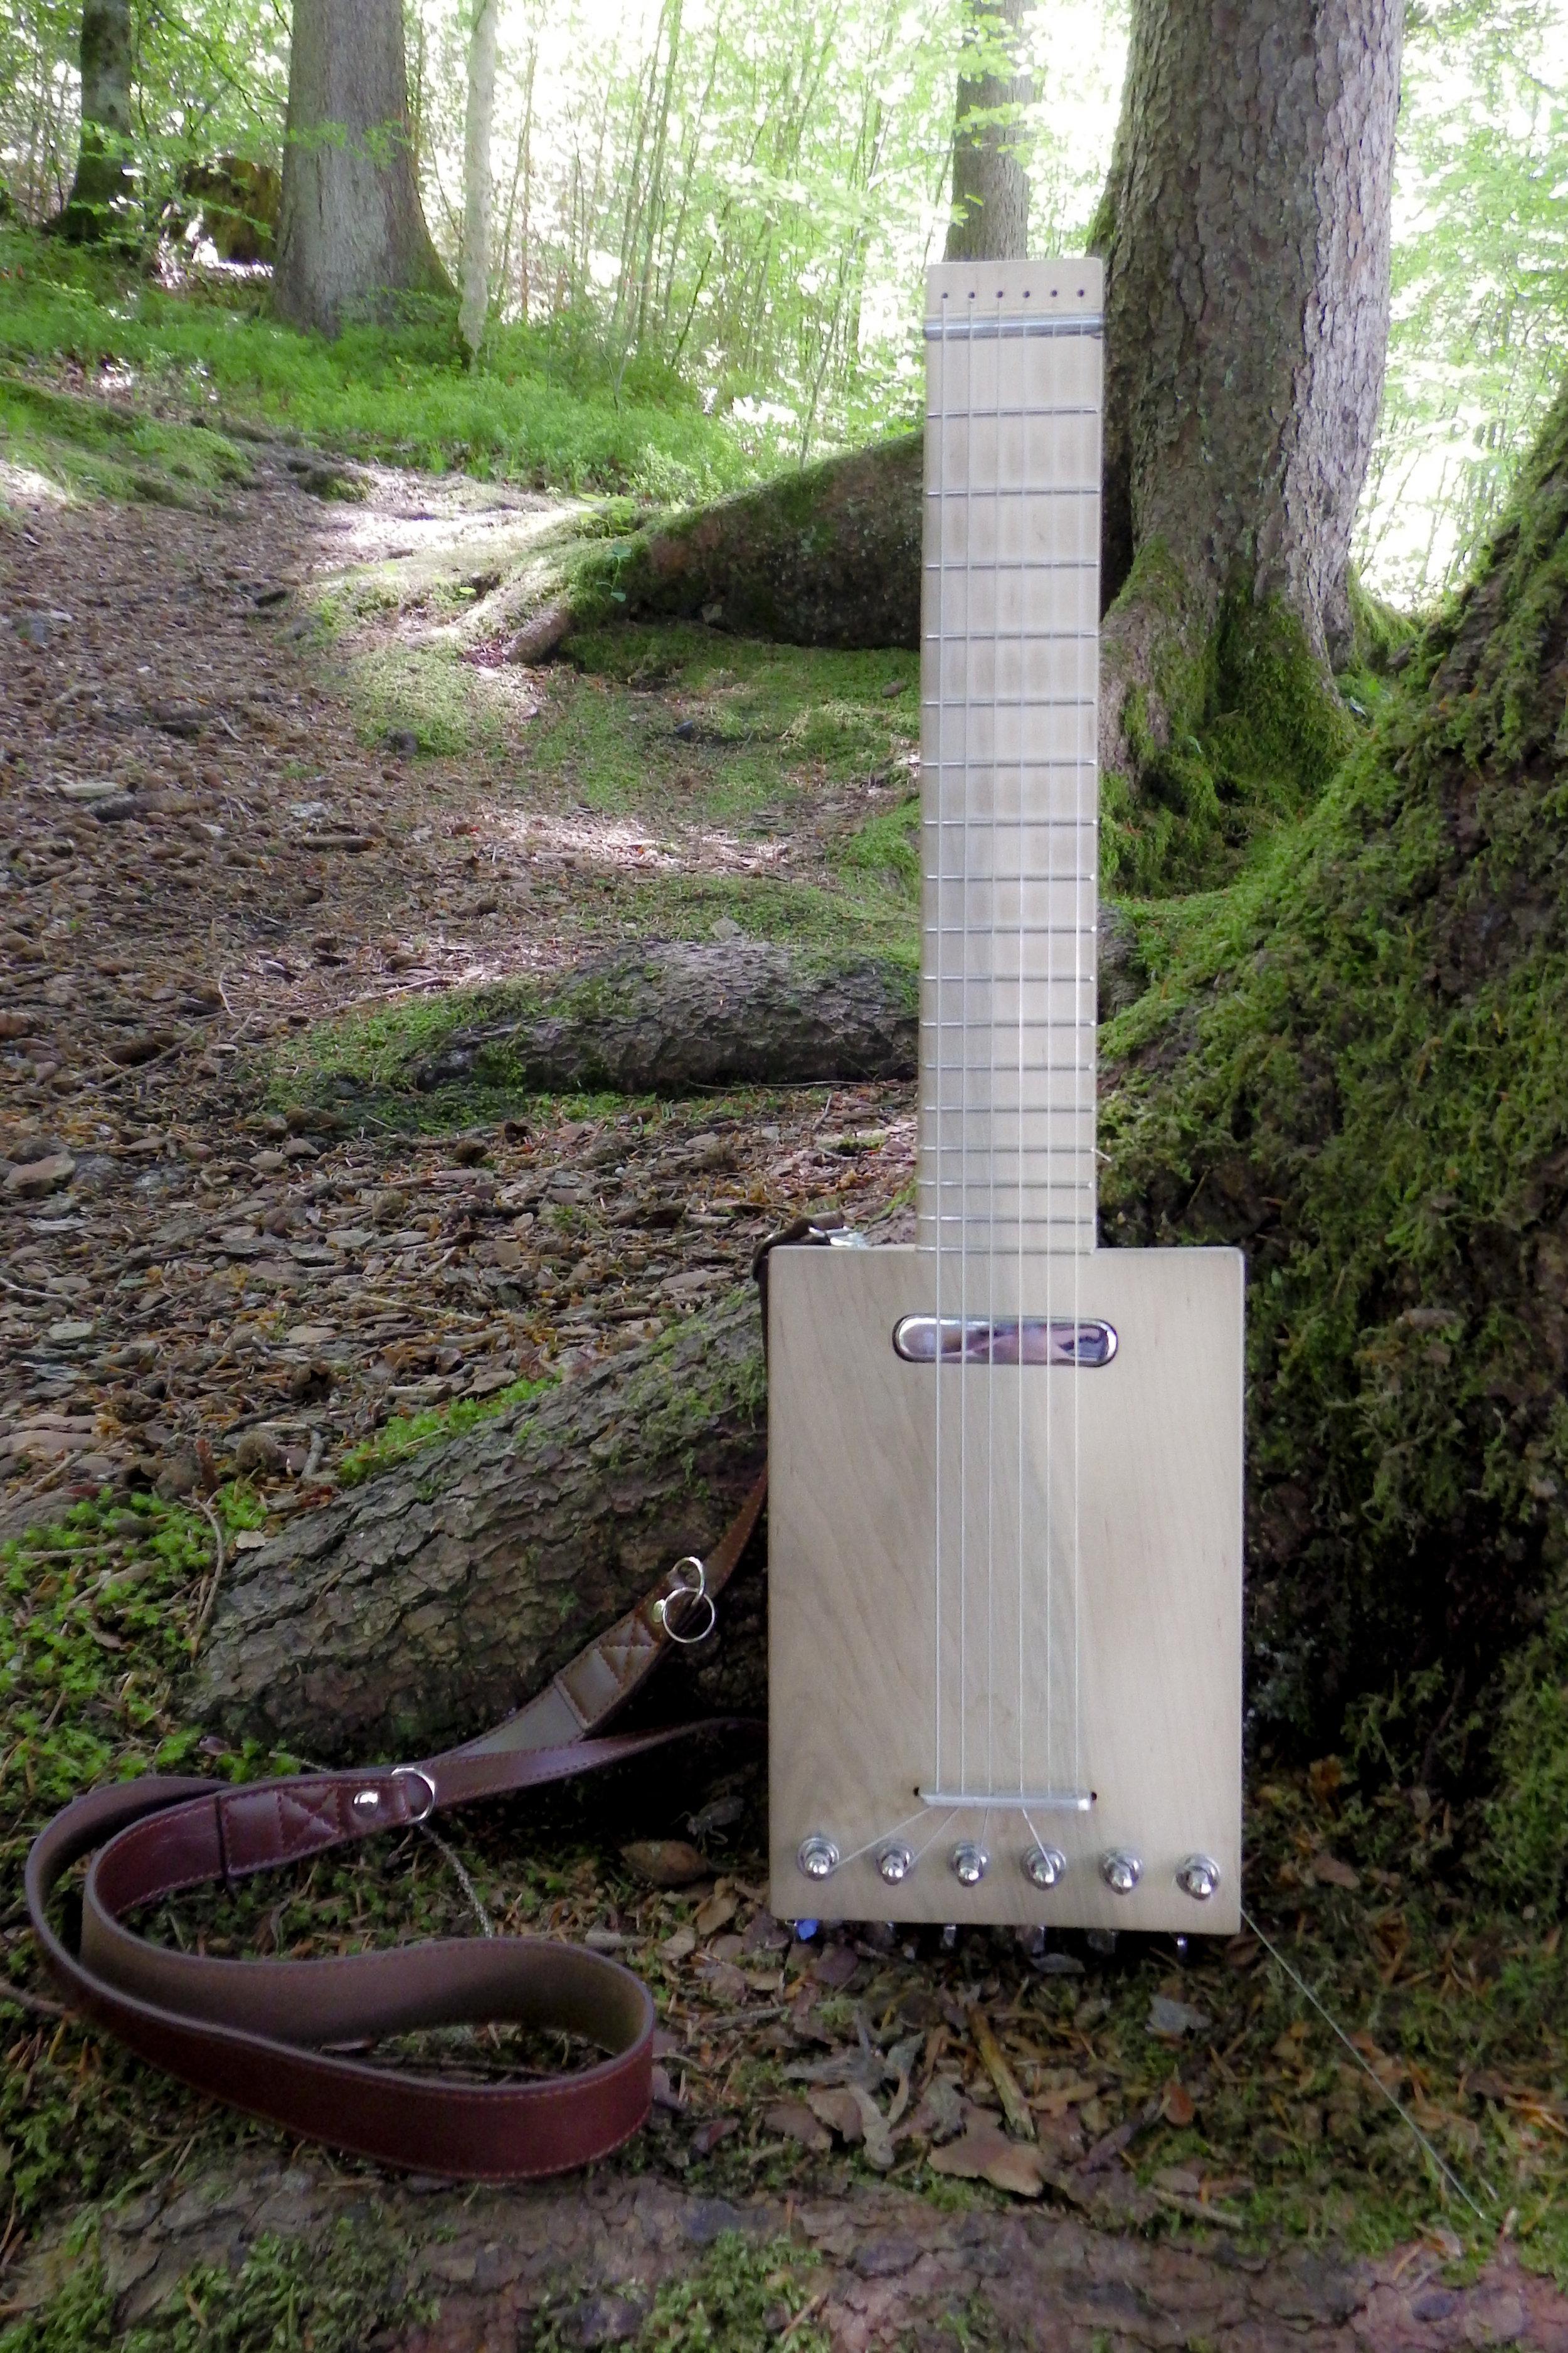 Guitar_0026.jpg